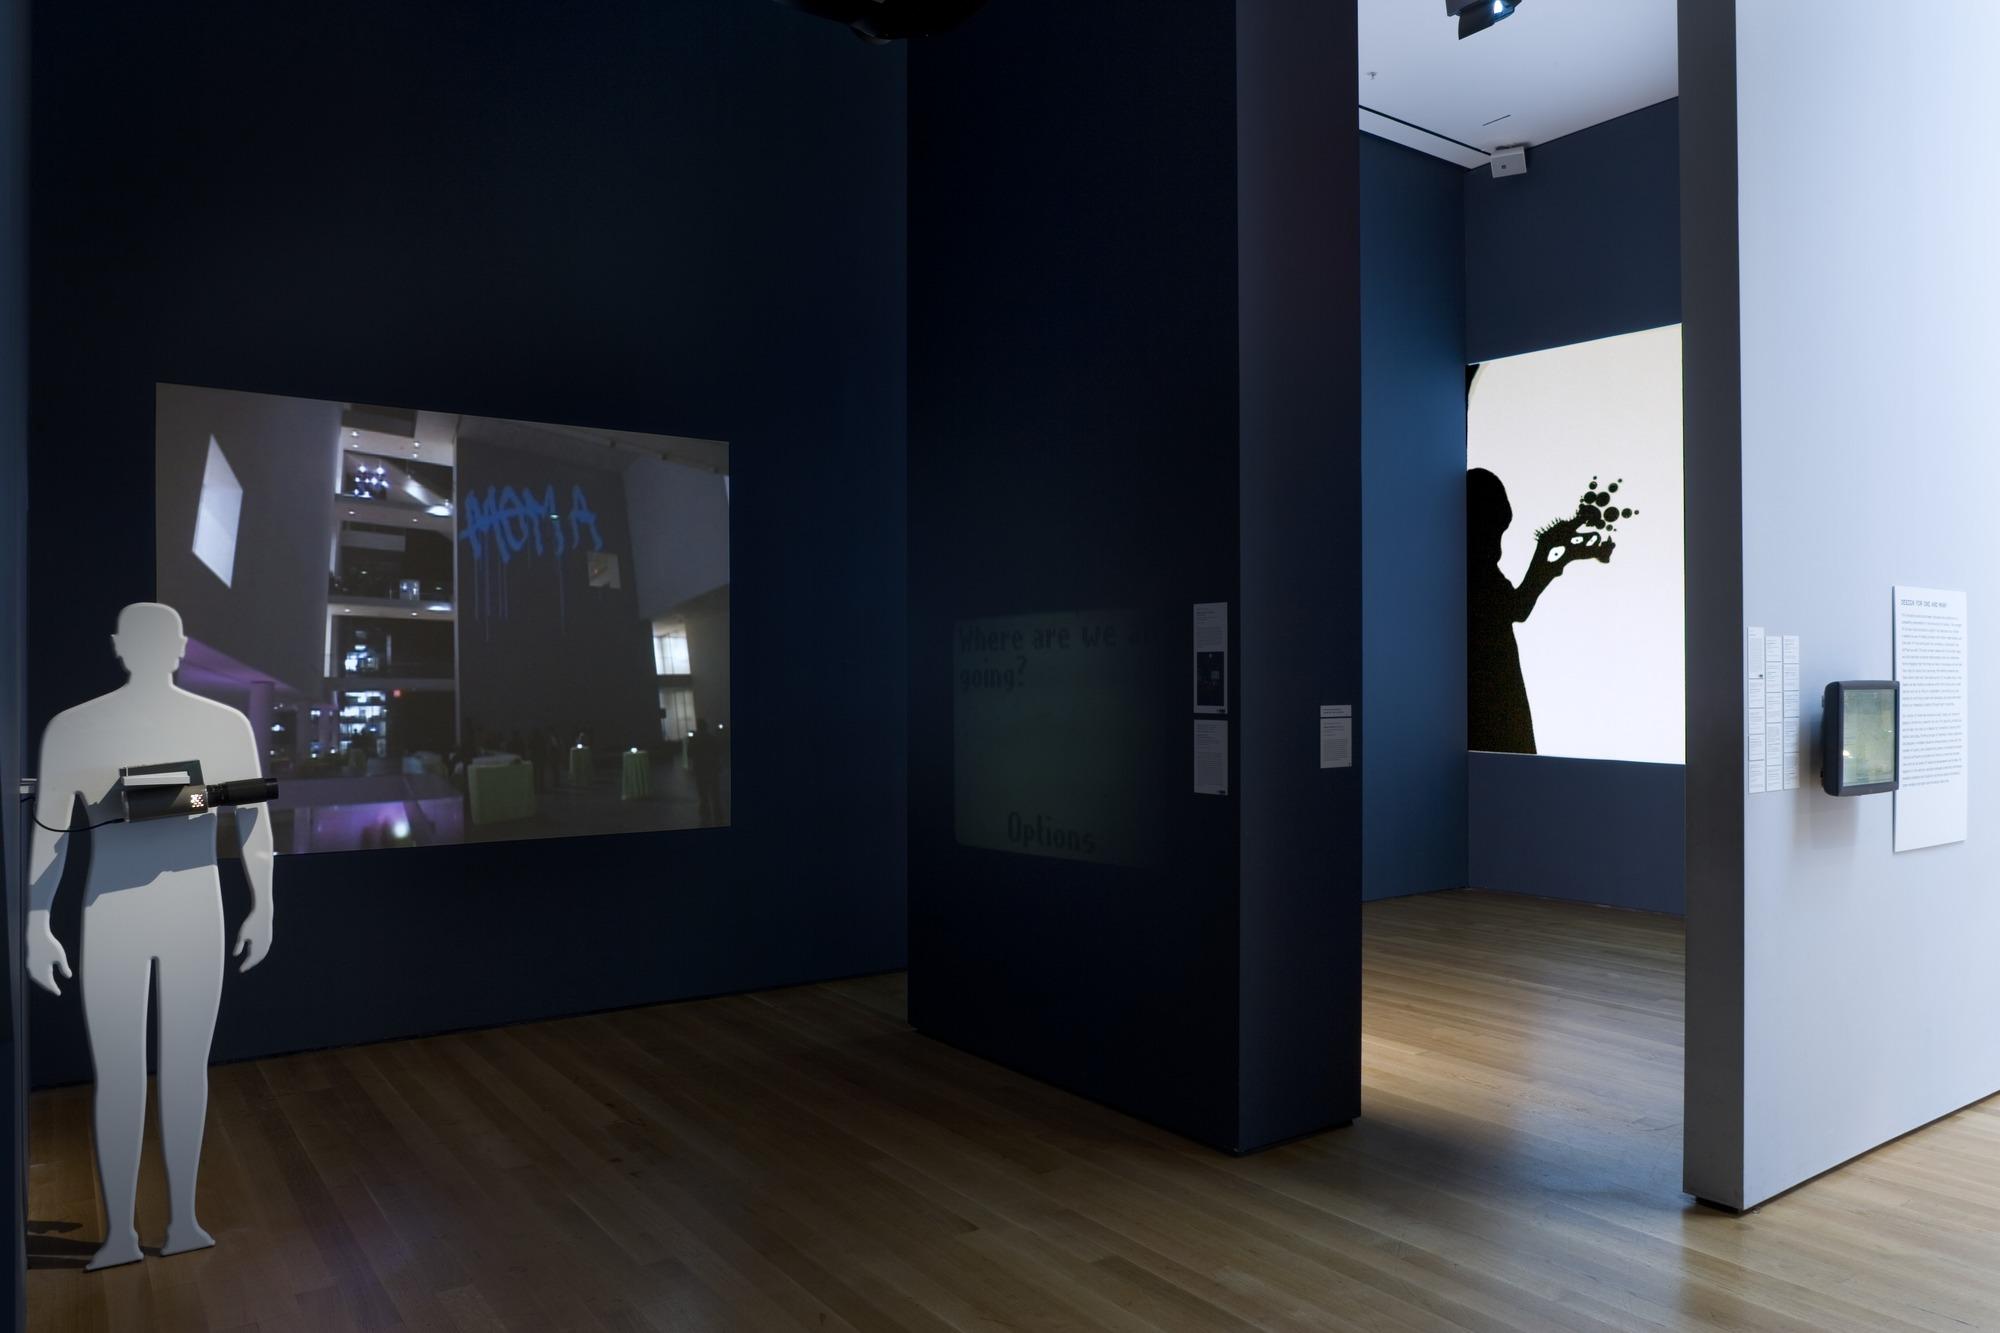 'Design and the Elastic Mind', Installation View, 2008 | Troika (Conny Freyer, Eva Rucki, Sebastien Noel)